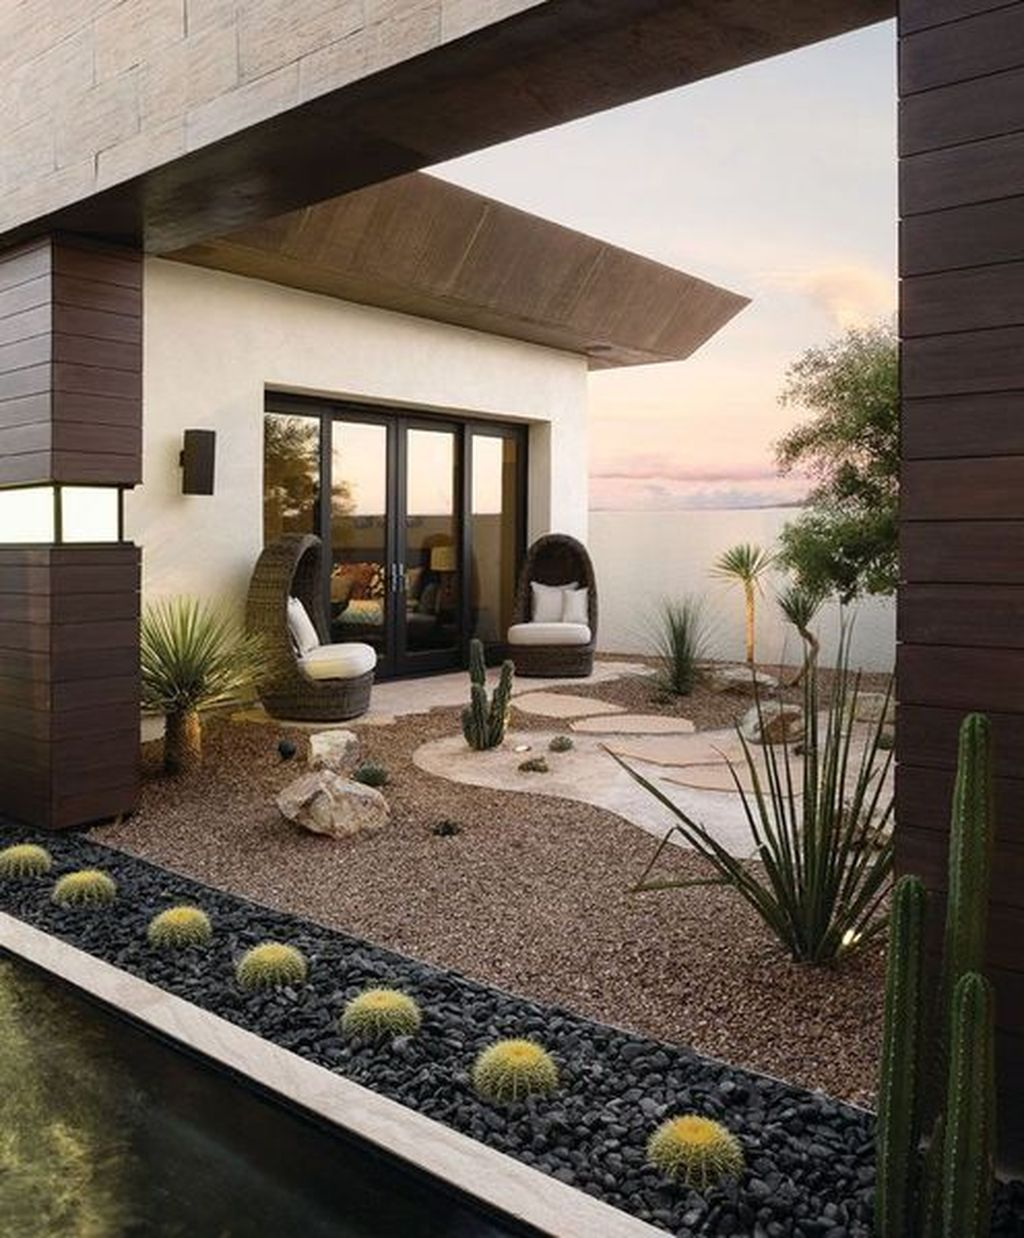 Incredible Cactus Garden Landscaping Ideas Best For Summer 06